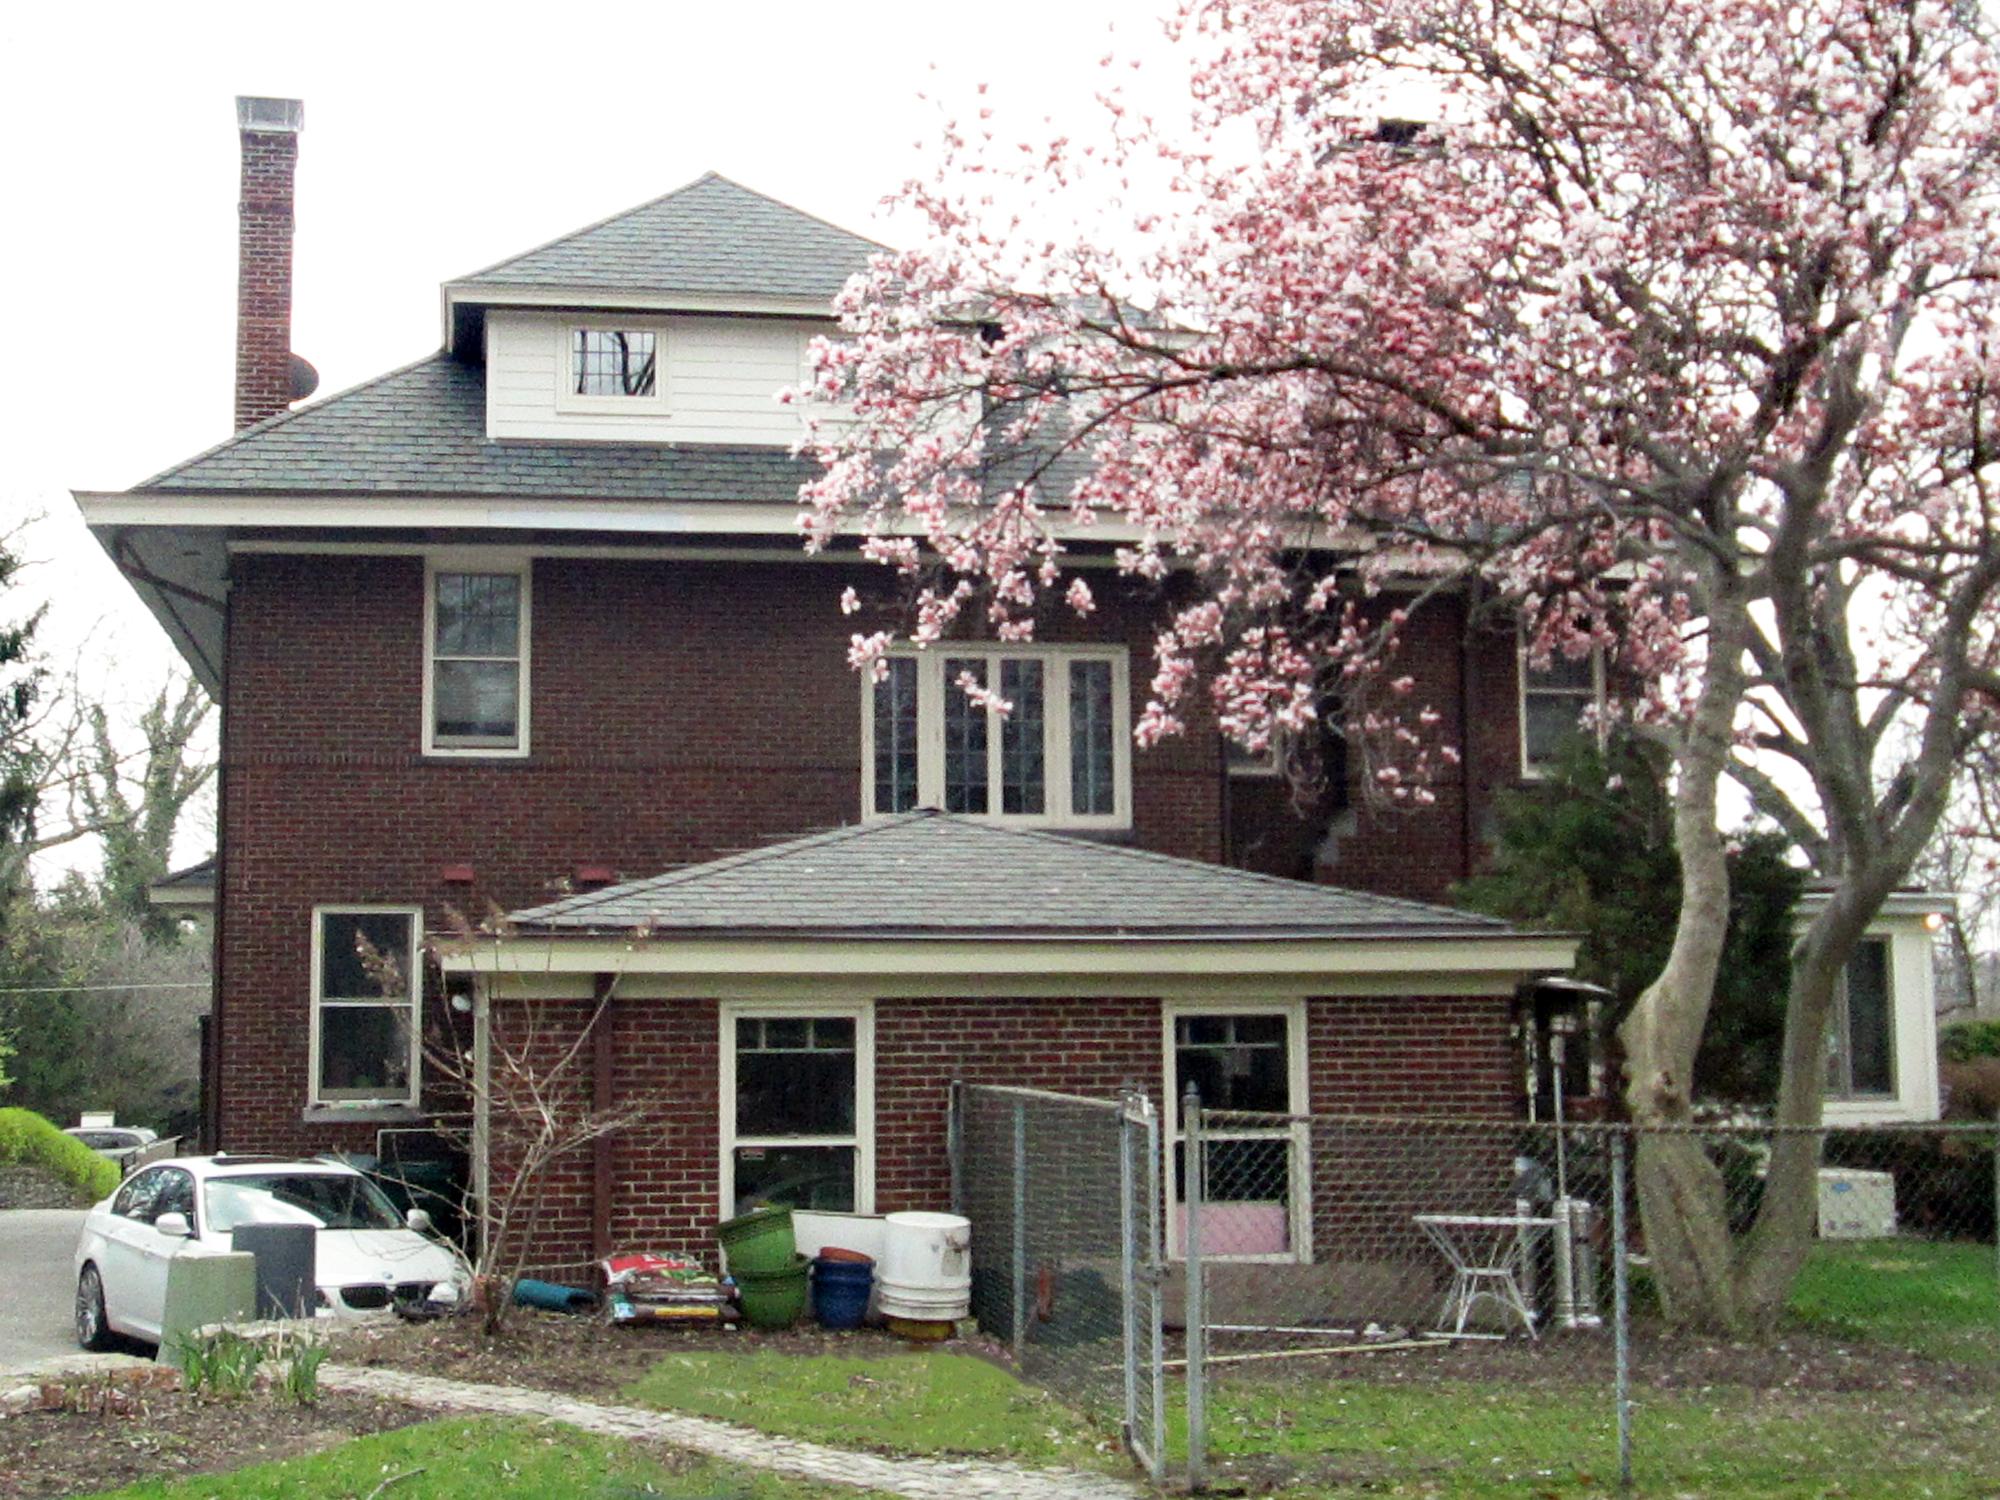 Existing house and garage Hyde Park, Cincinnati Residence